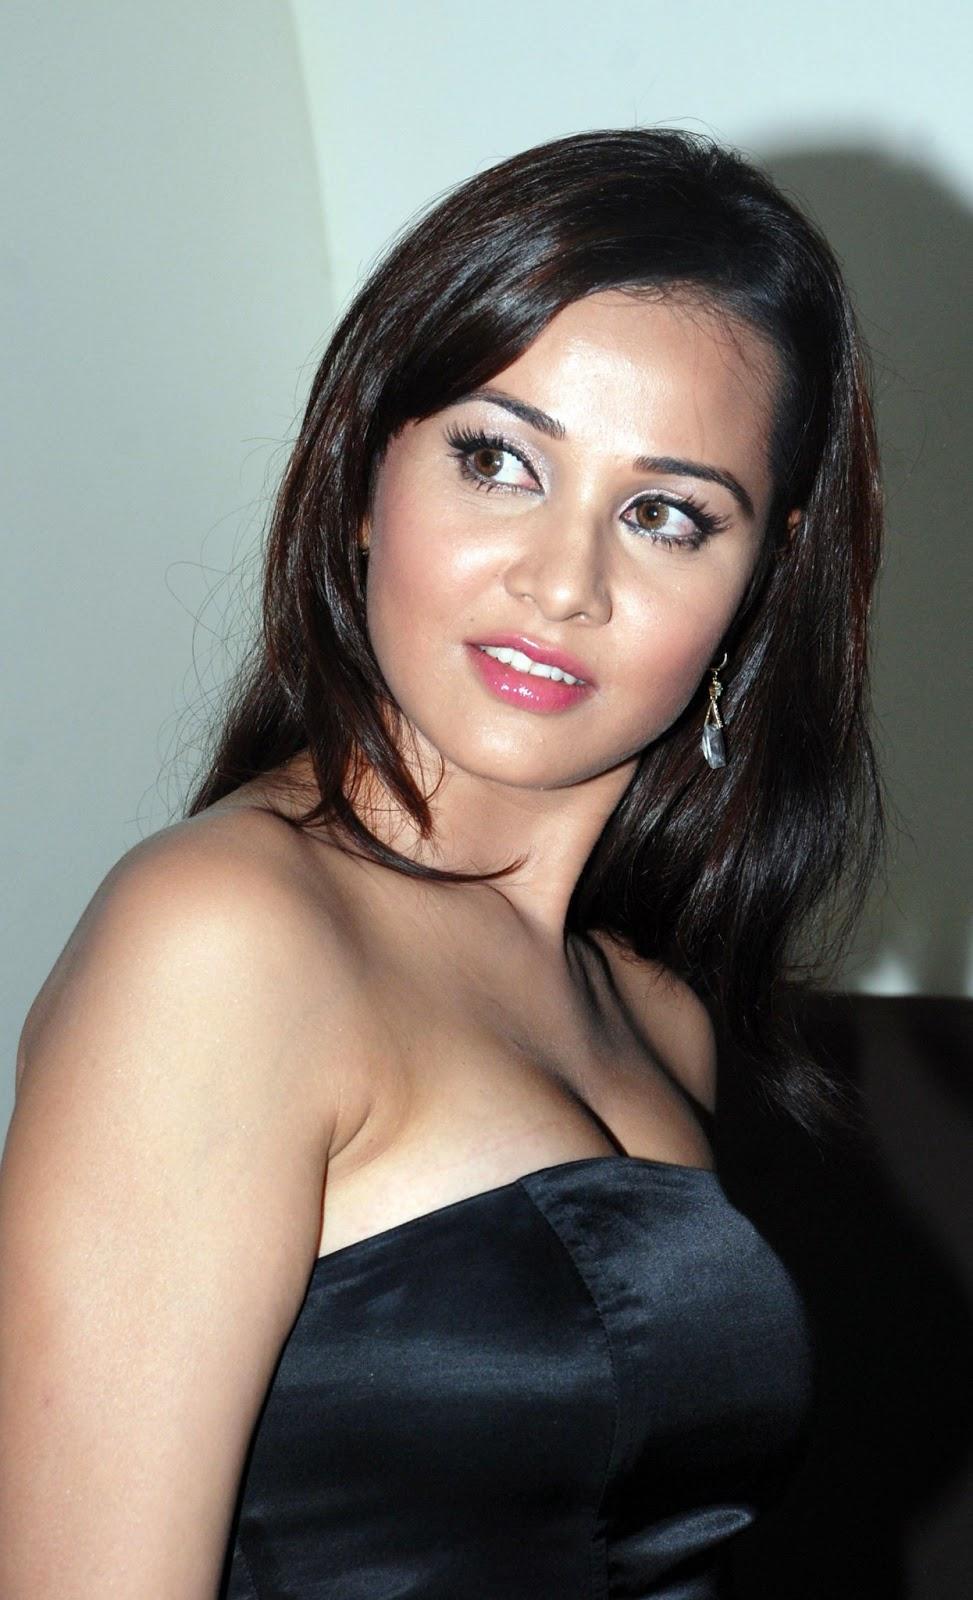 Priyanka Kothari nudes (38 photo), Pussy, Bikini, Twitter, braless 2019